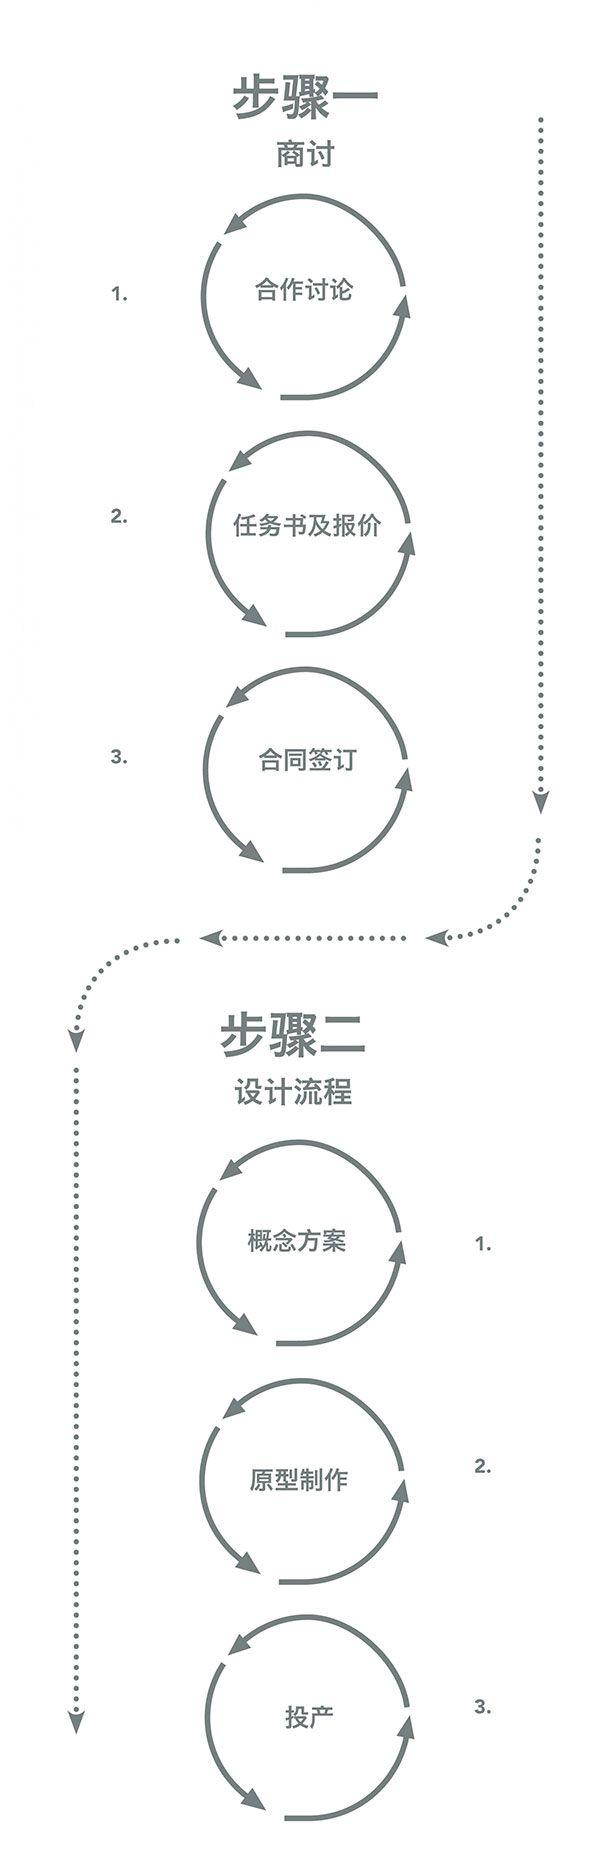 Collaboration process